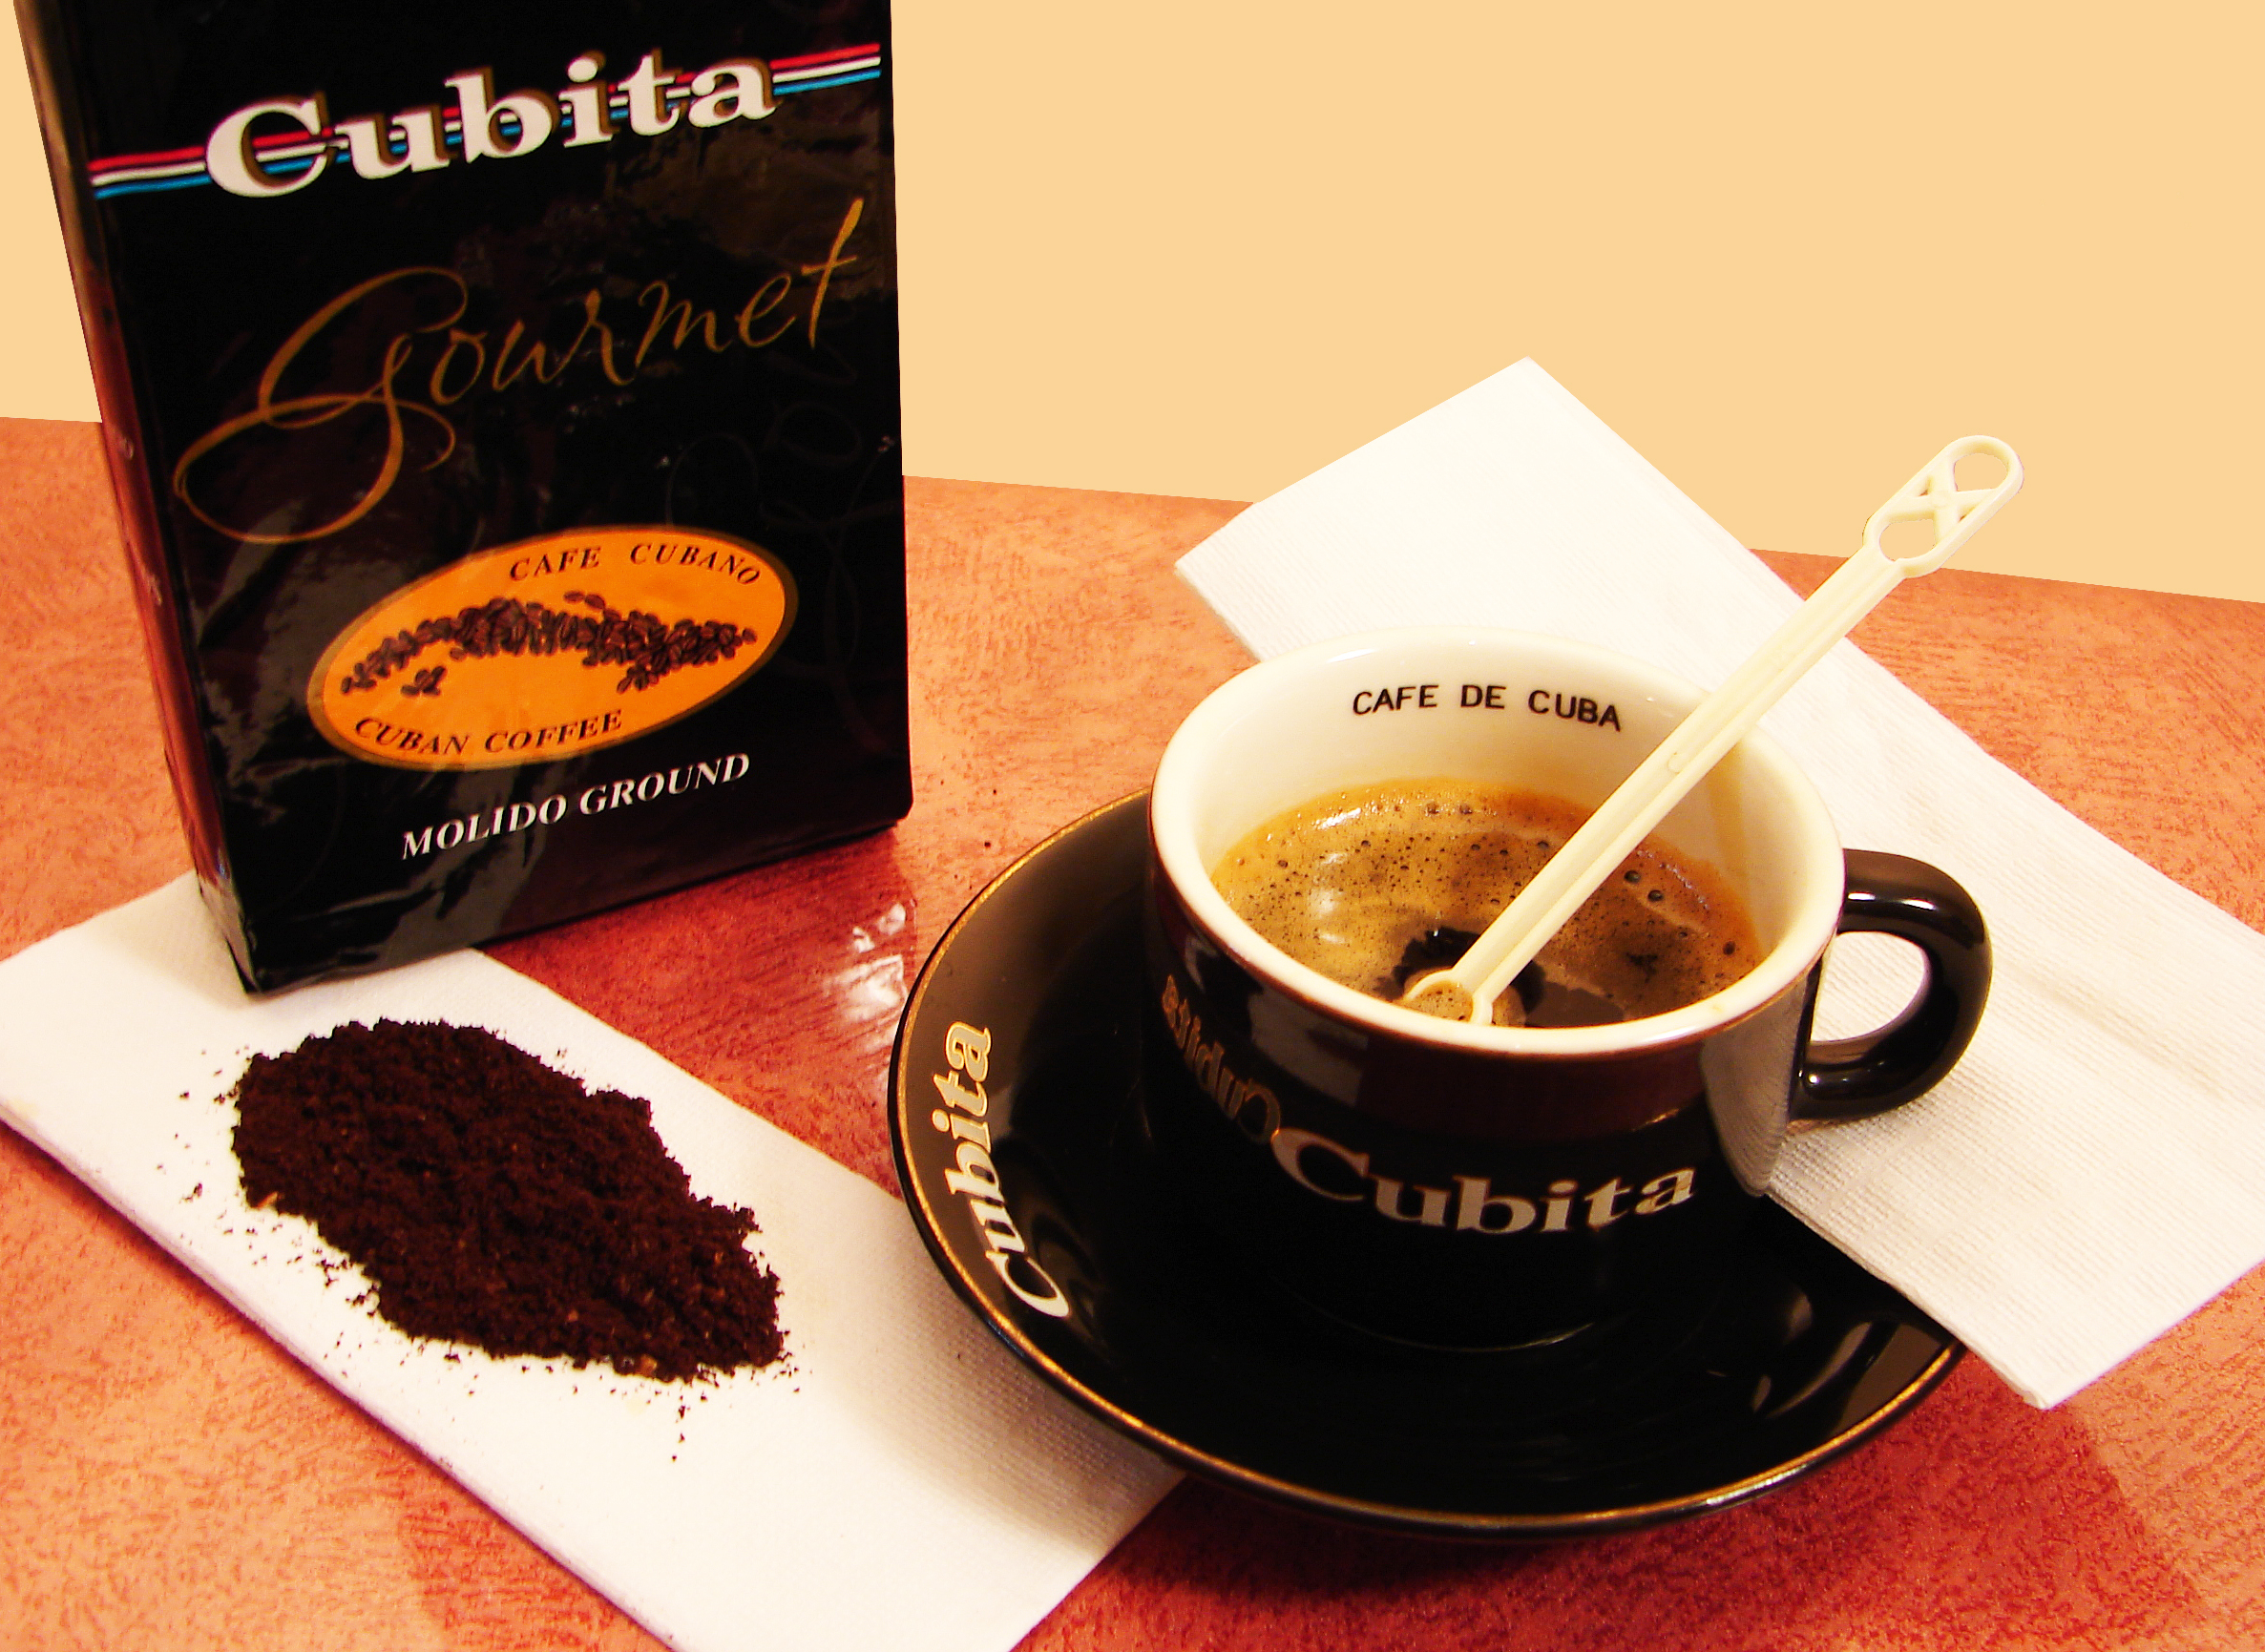 Cafe_cubano_de_la_marca_Cubita_Gourmet